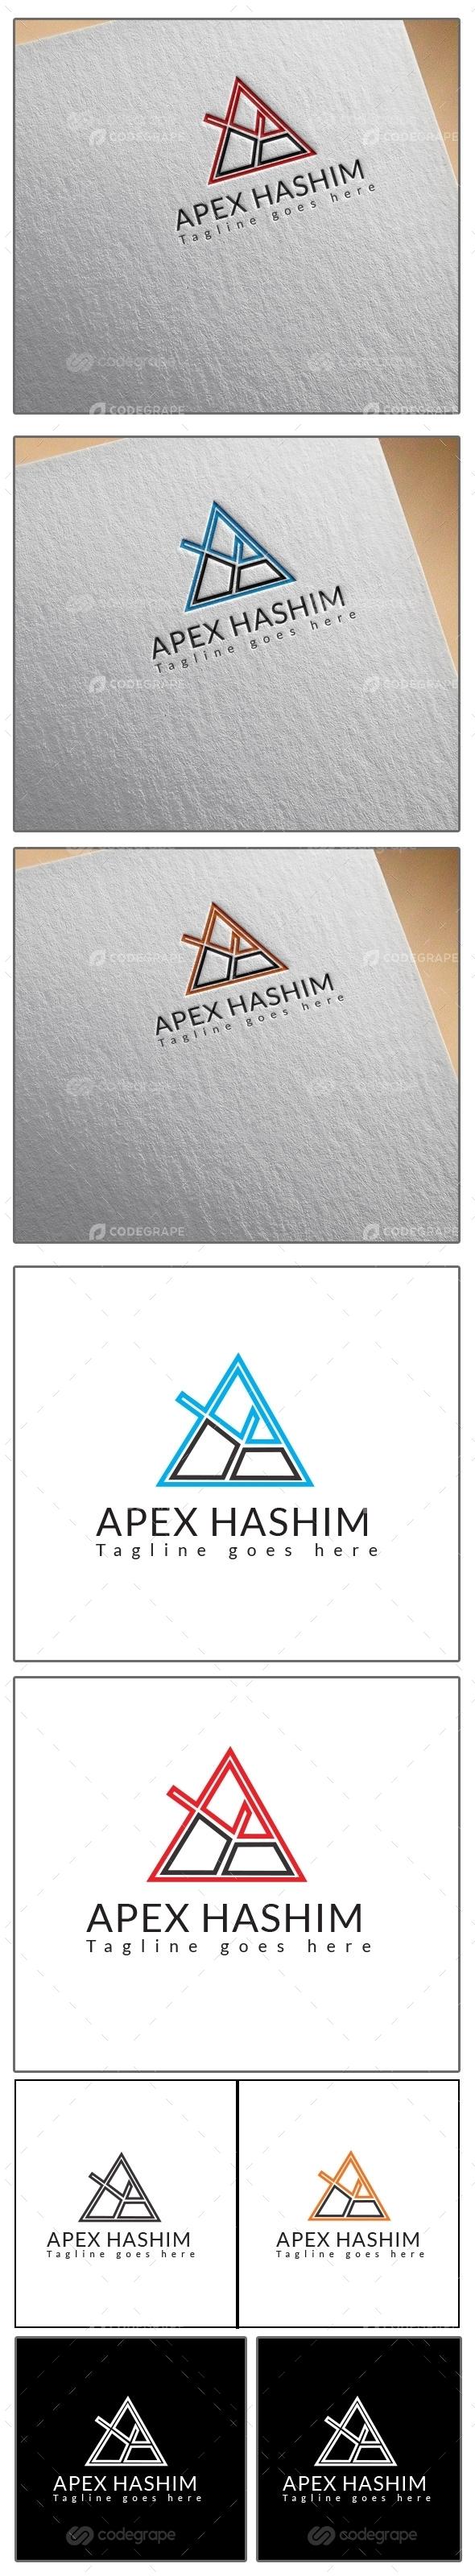 Apex Hashim Logo